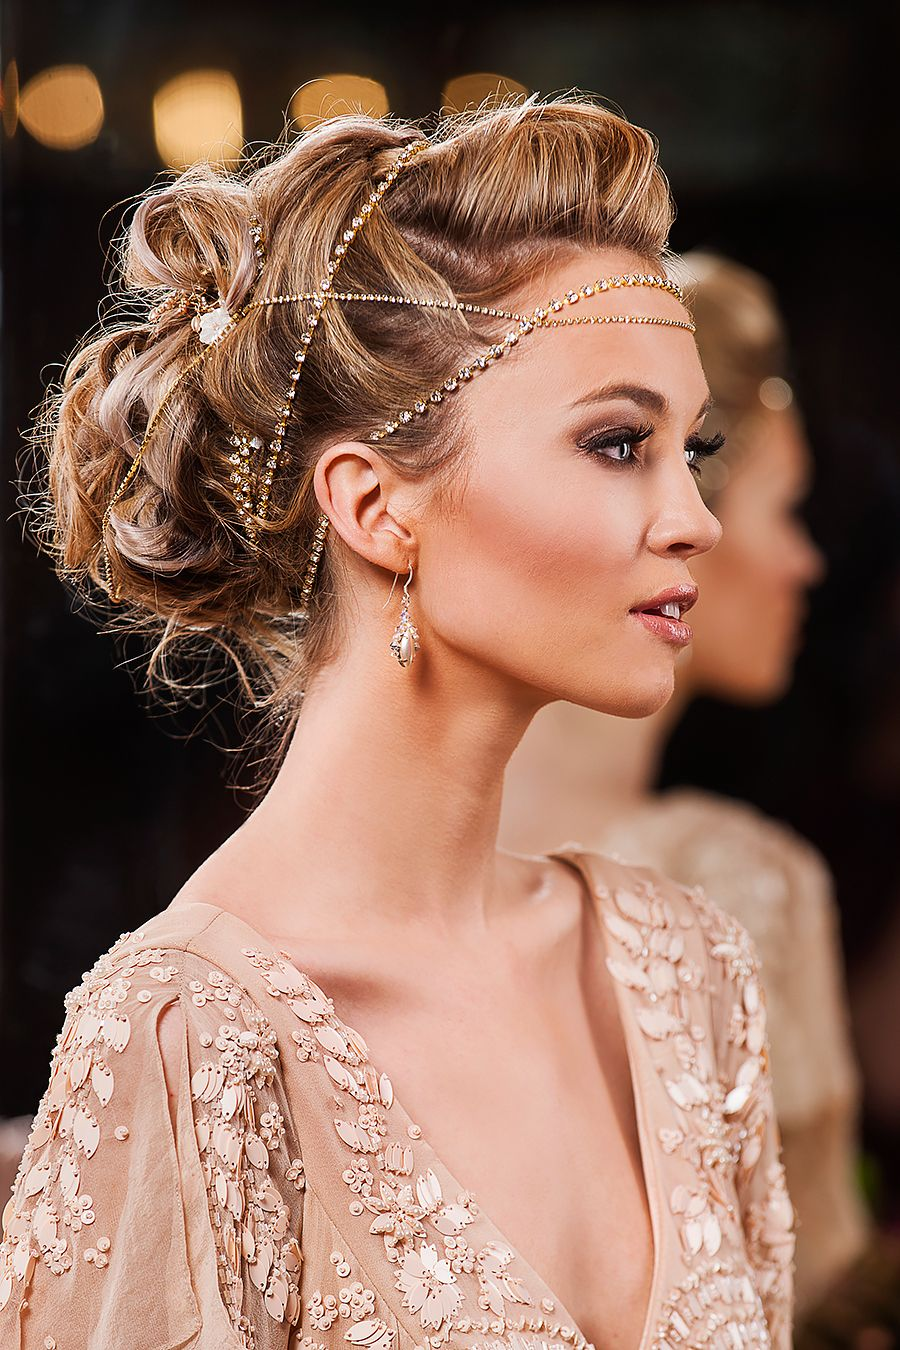 luxury wedding accessories | headpieces and veils | wedding